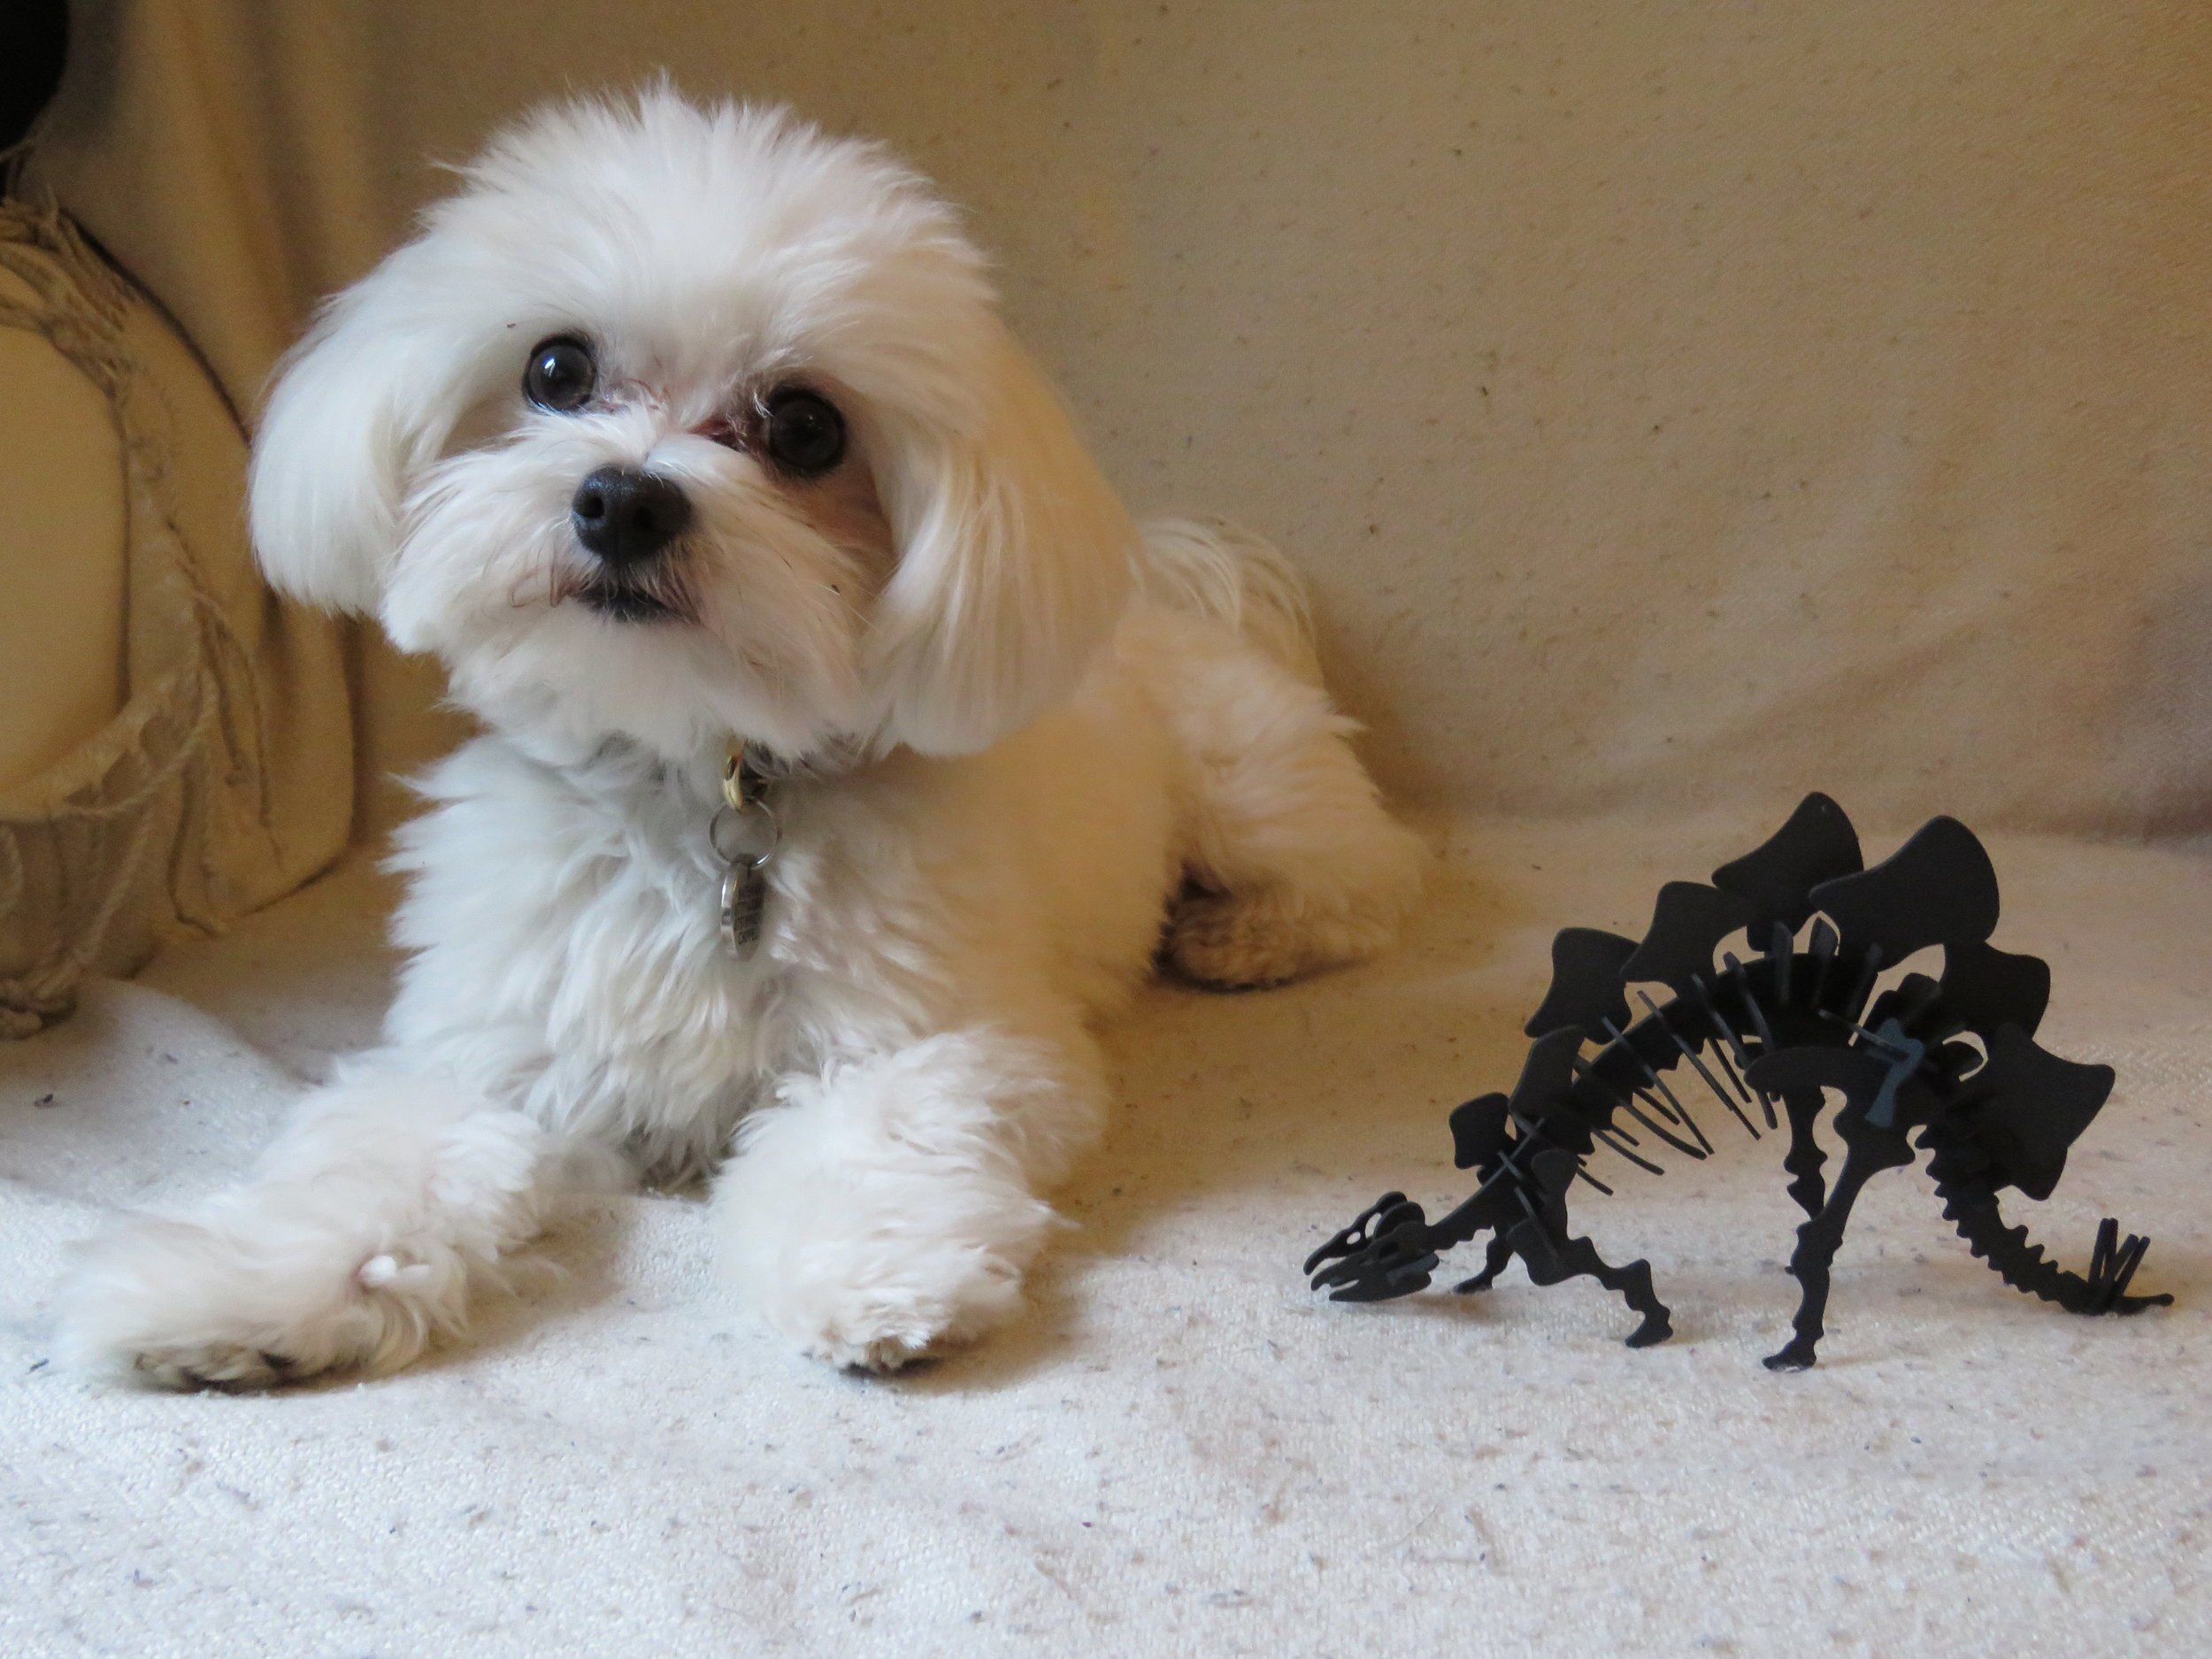 Casper and the stegosaurus | Credit: Talita Bateman